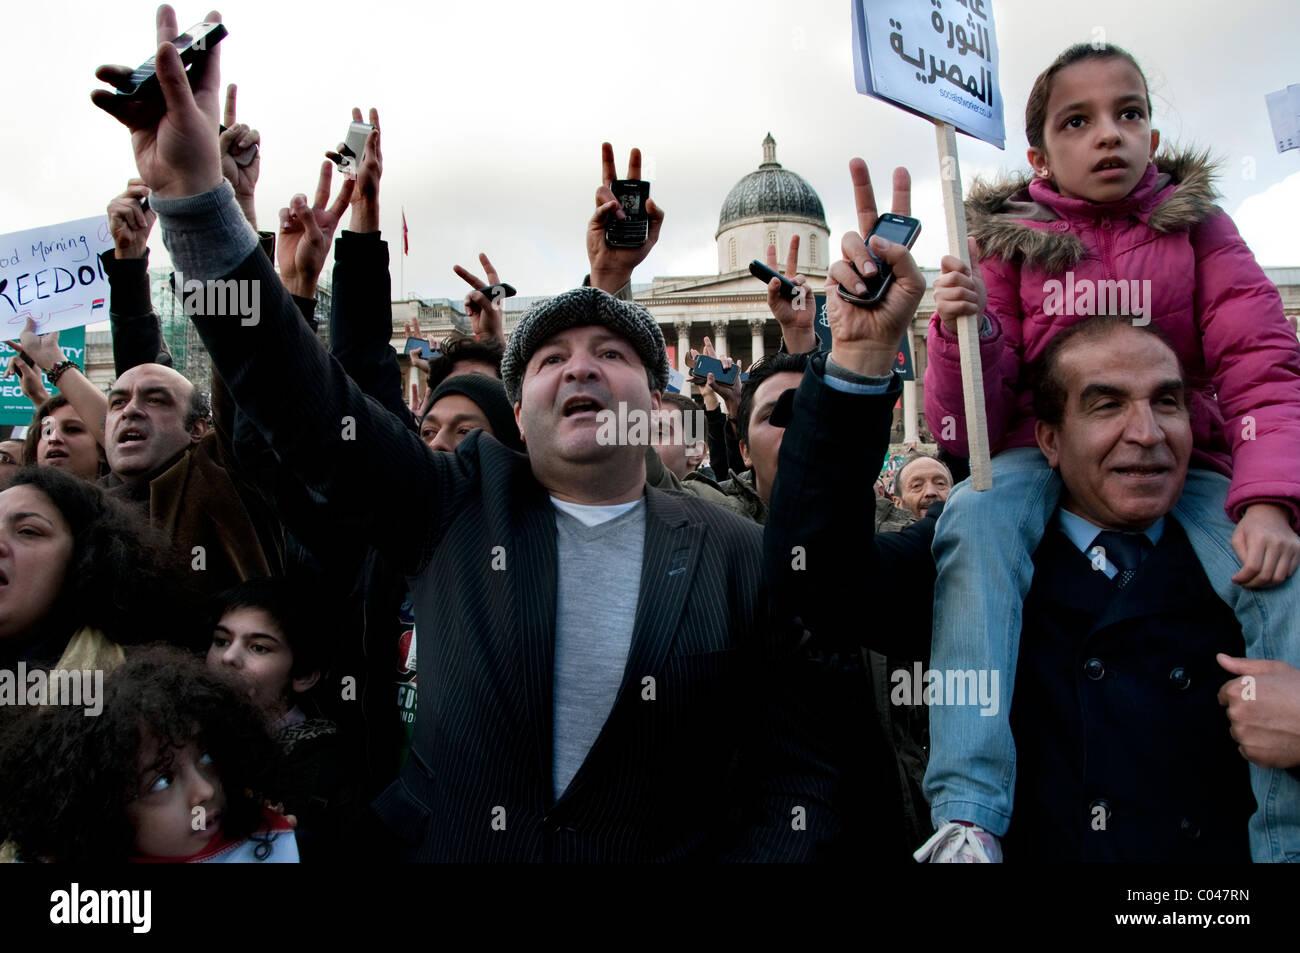 Egyptian Victory celebration on Mubarak's resignation organized by Amnesty International Trafalgar Square London - Stock Image